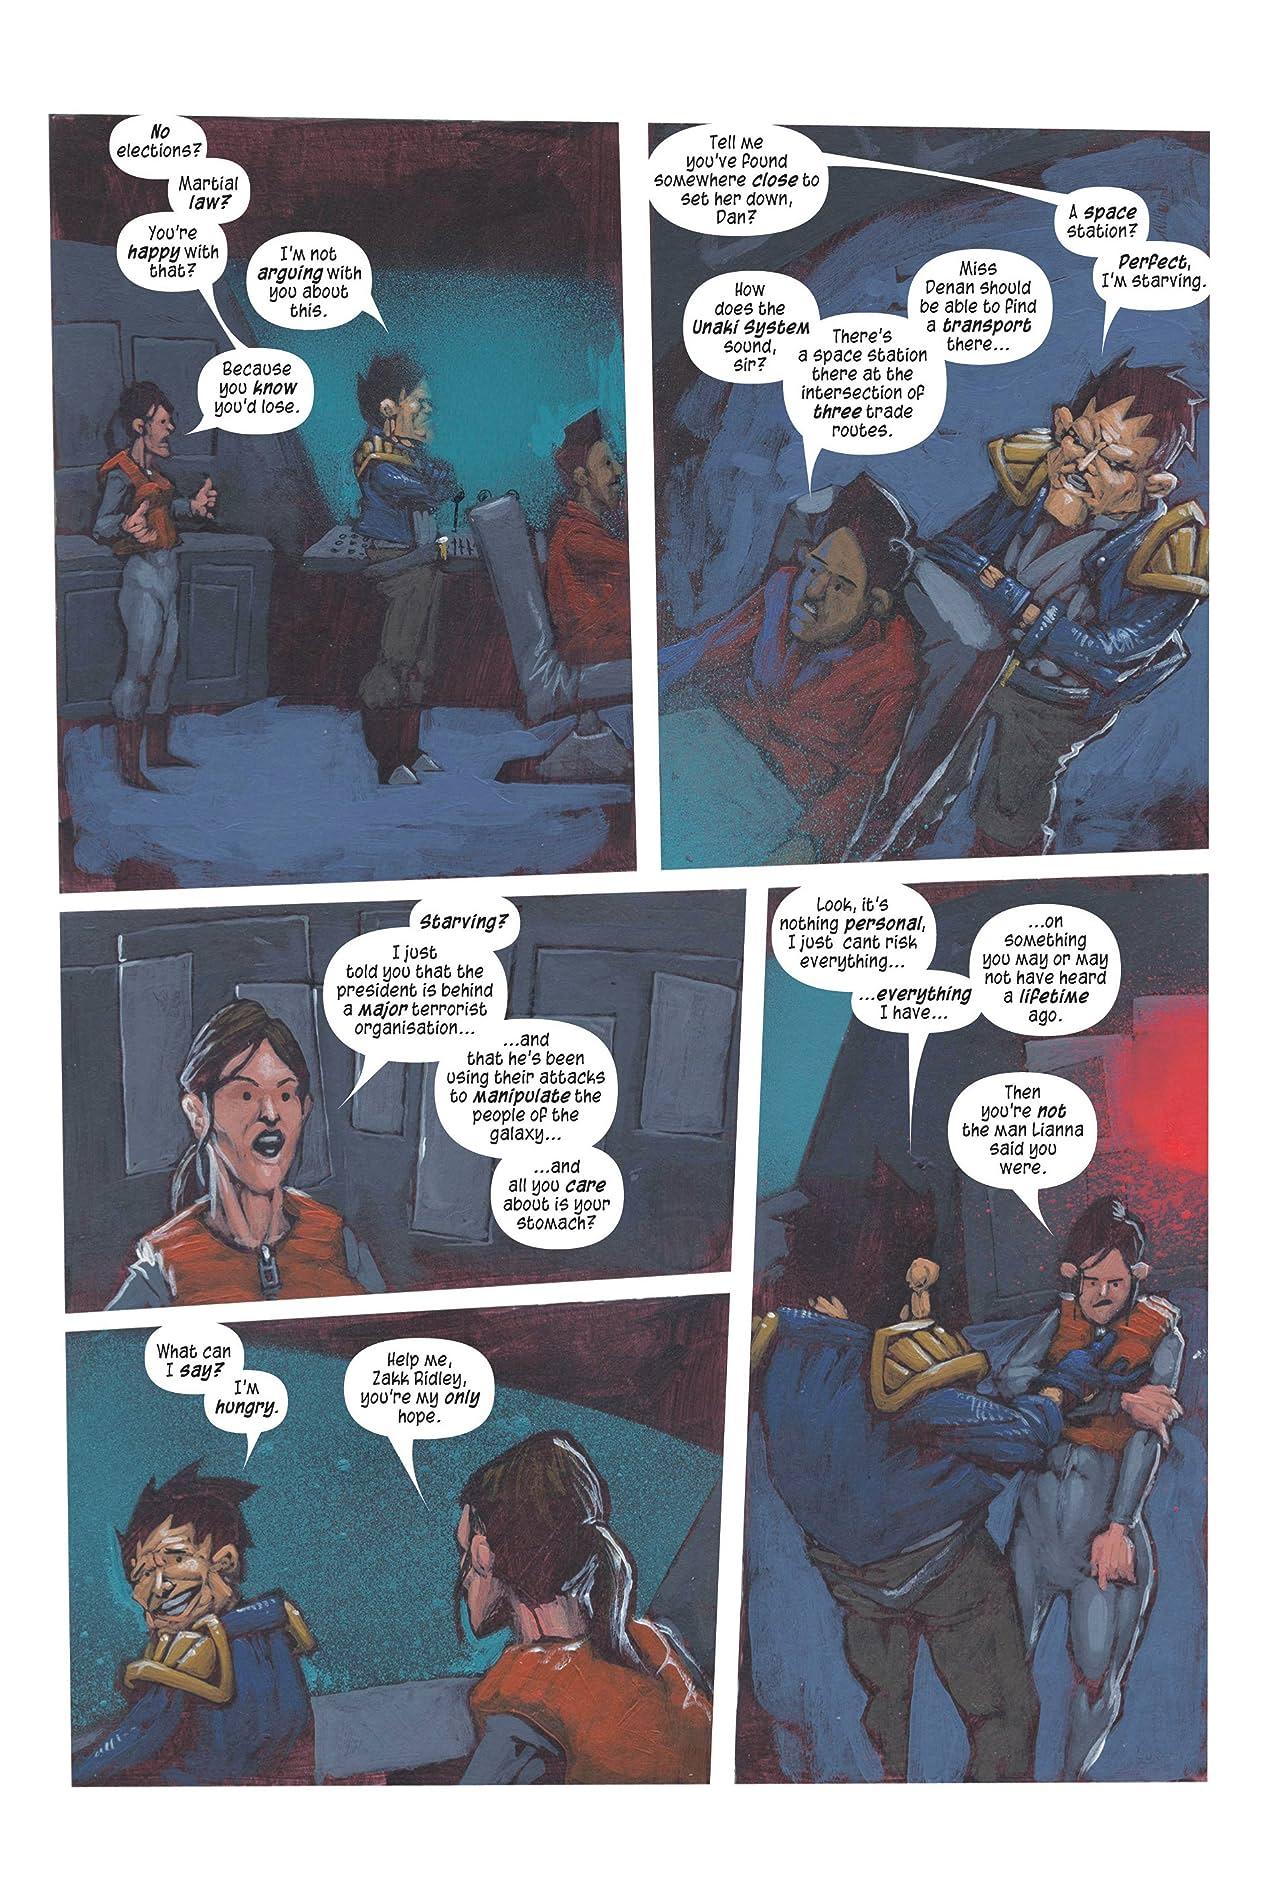 The Intergalactic Adventures of Zakk Ridley #3